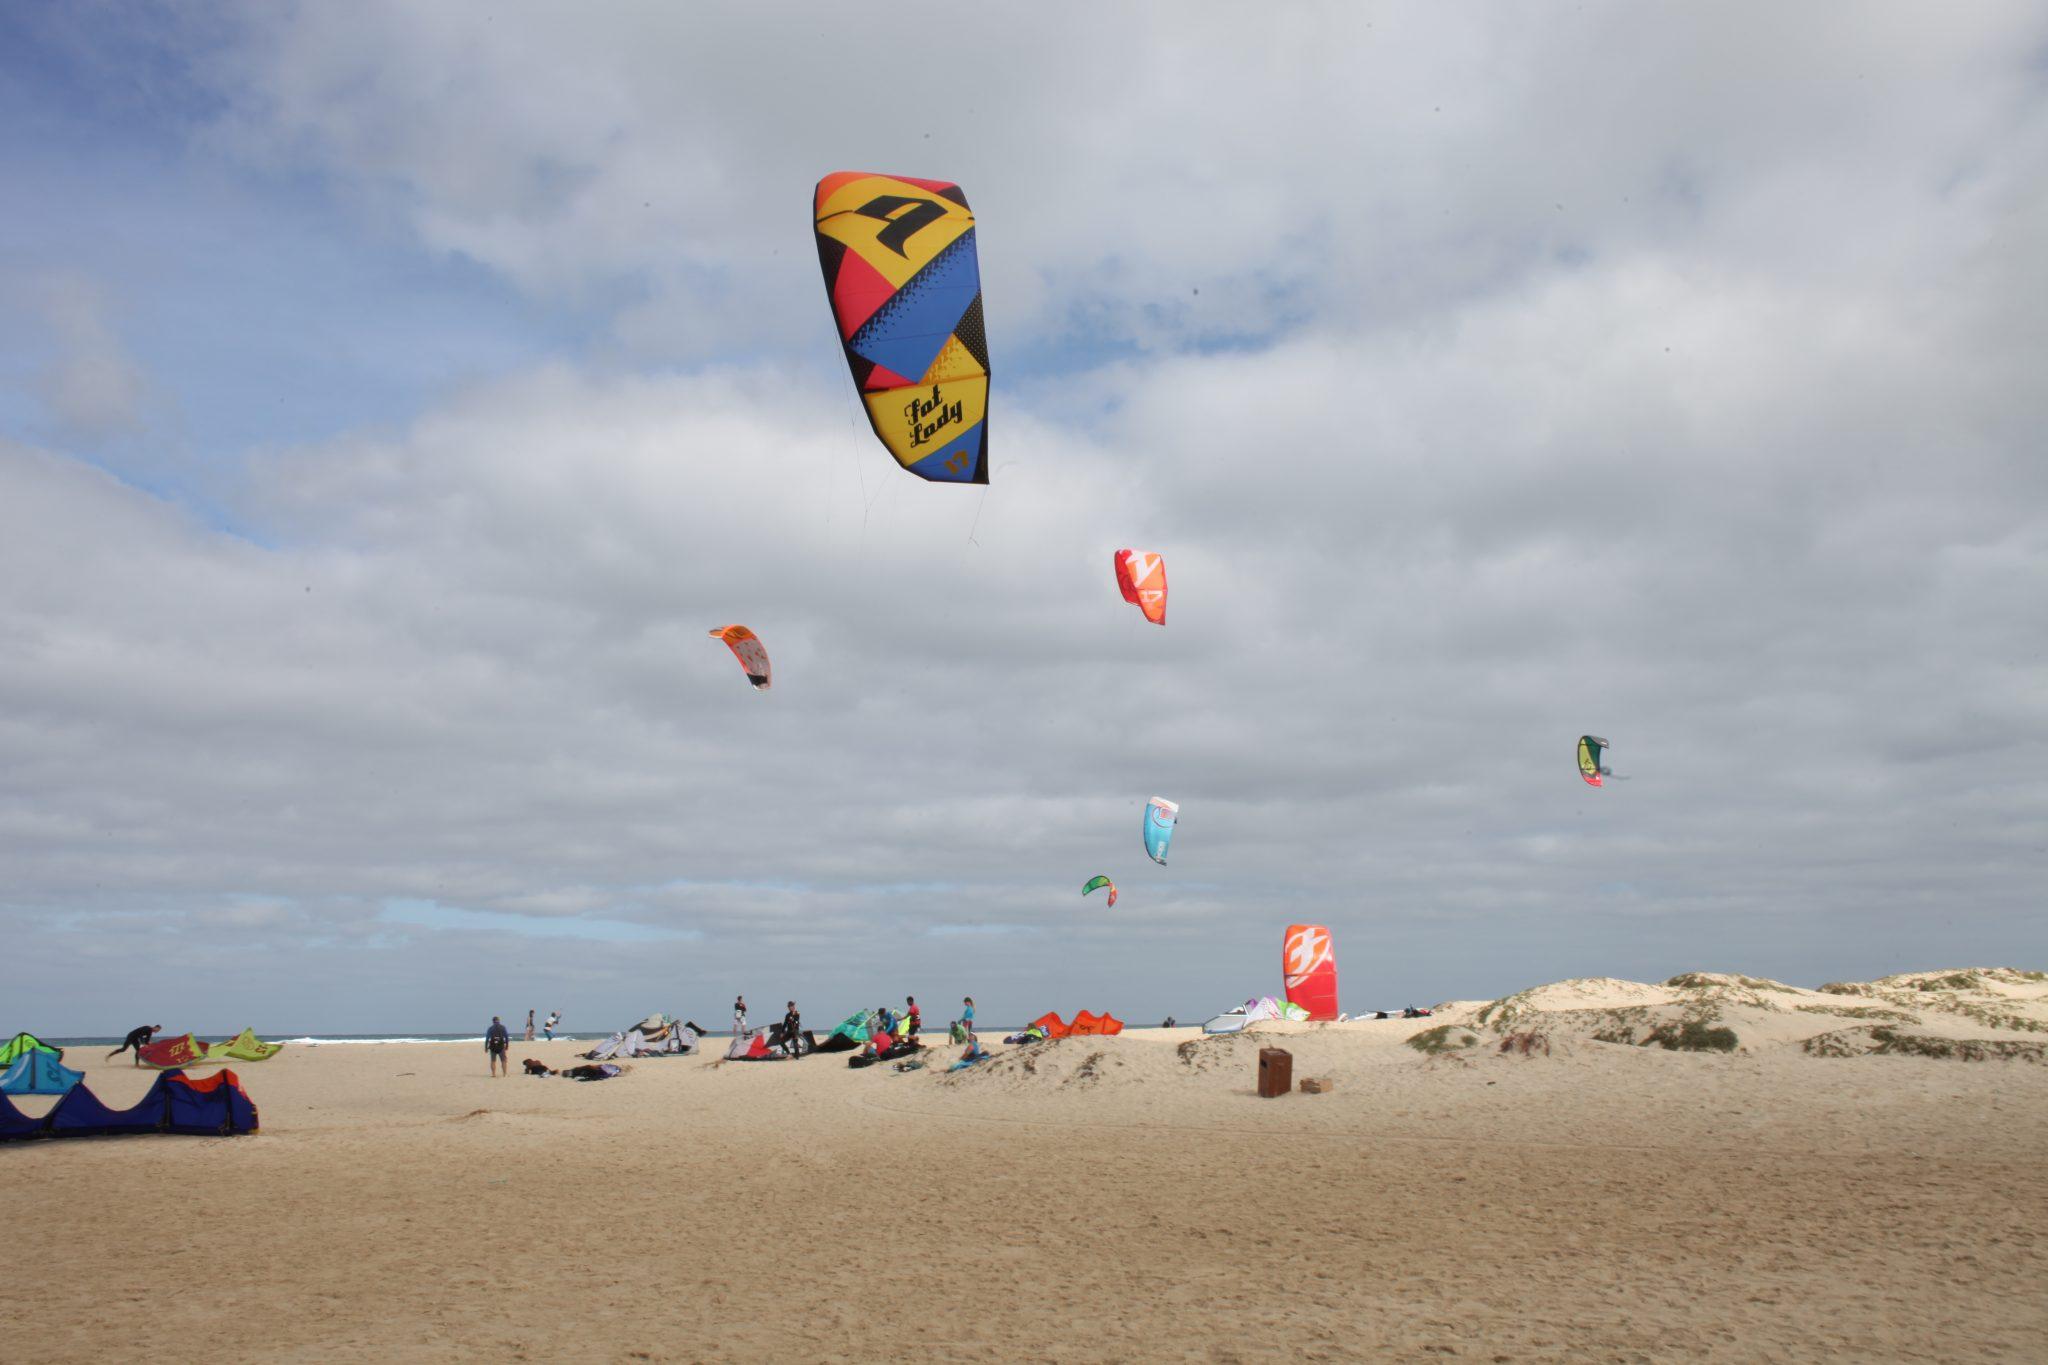 Kitesurfing beach, Sal Island, Cape Verde